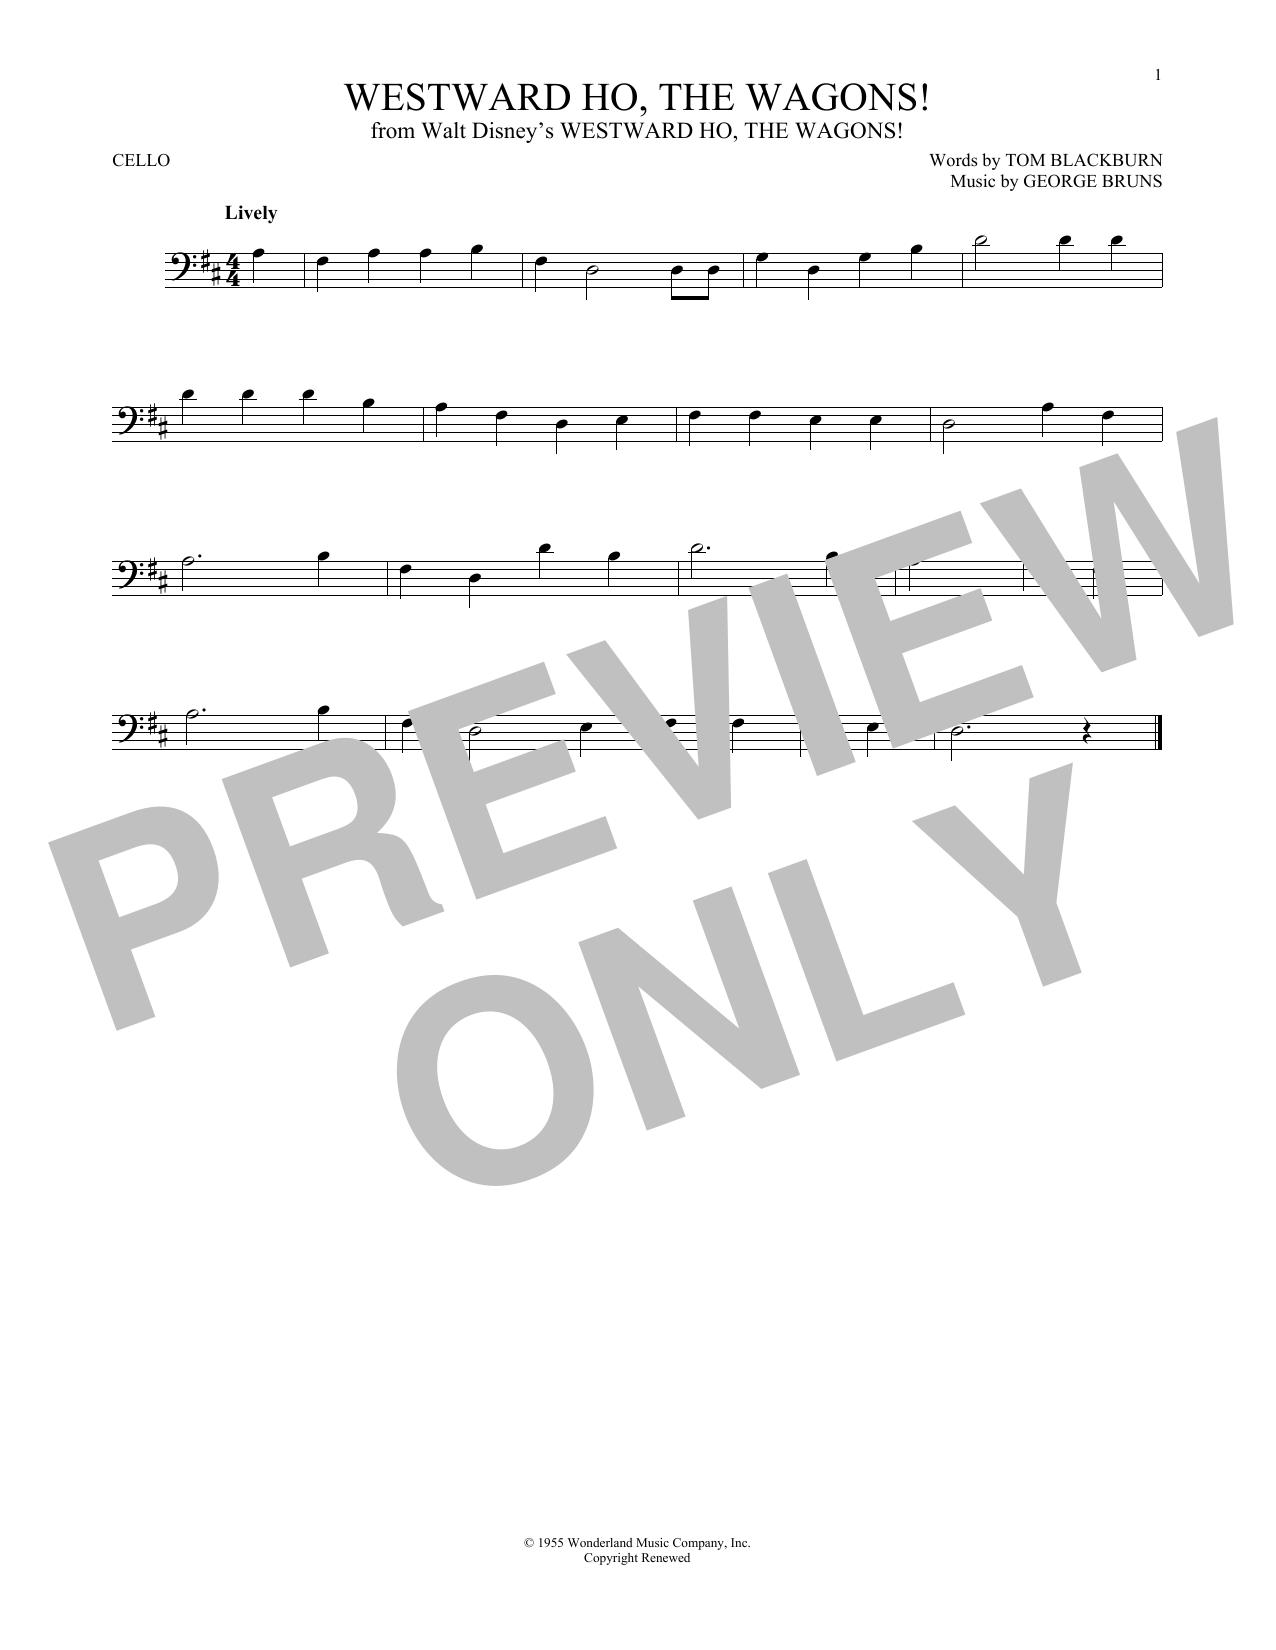 Westward Ho, The Wagons! (Cello Solo)